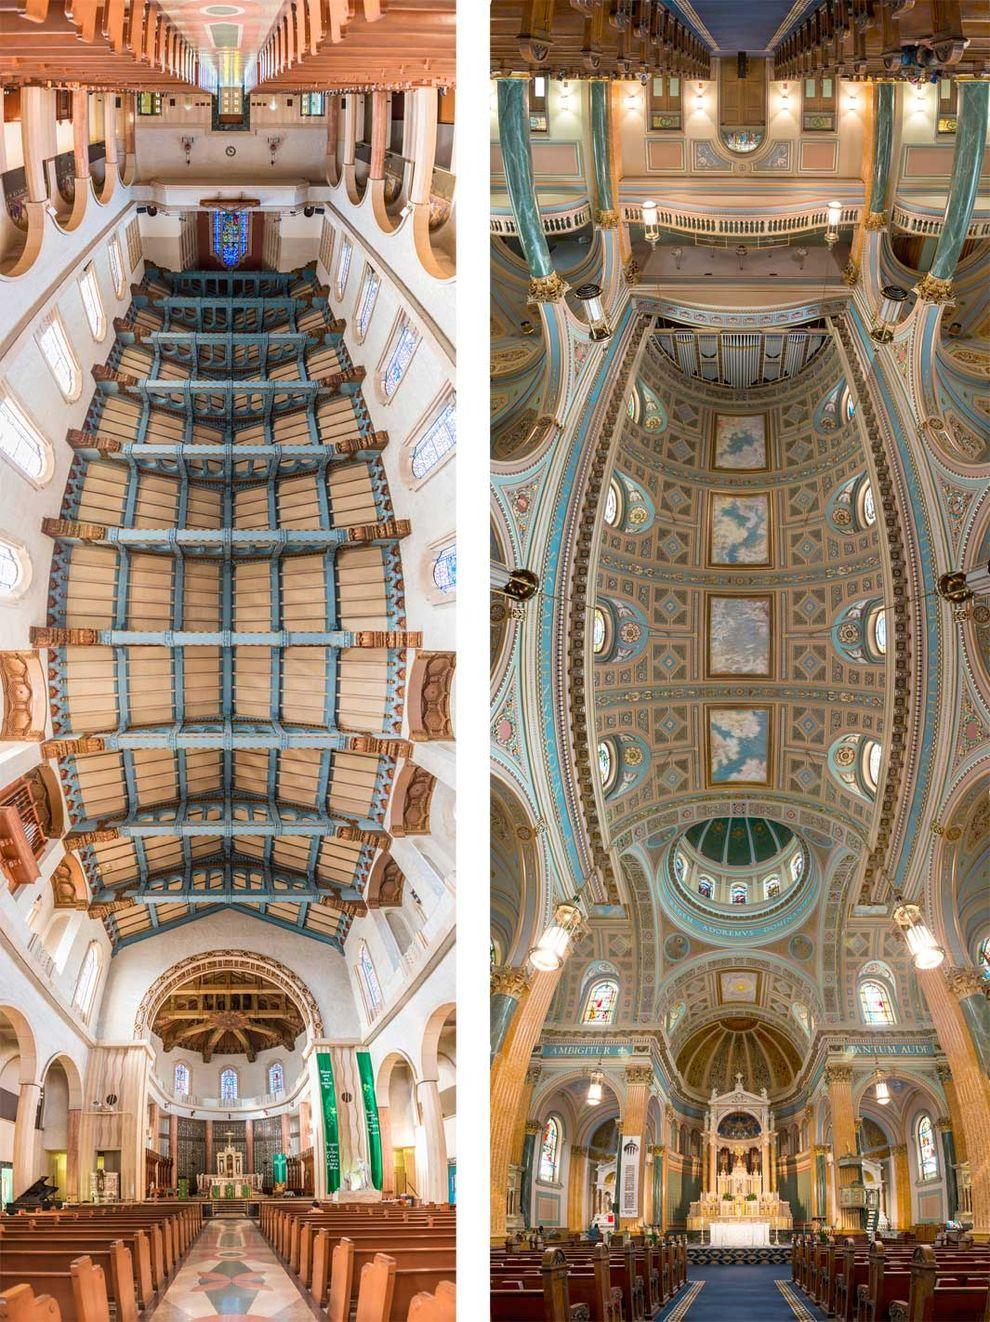 Потрясающие снимки храмов от входа до алтаря в одном фото (4 фото)